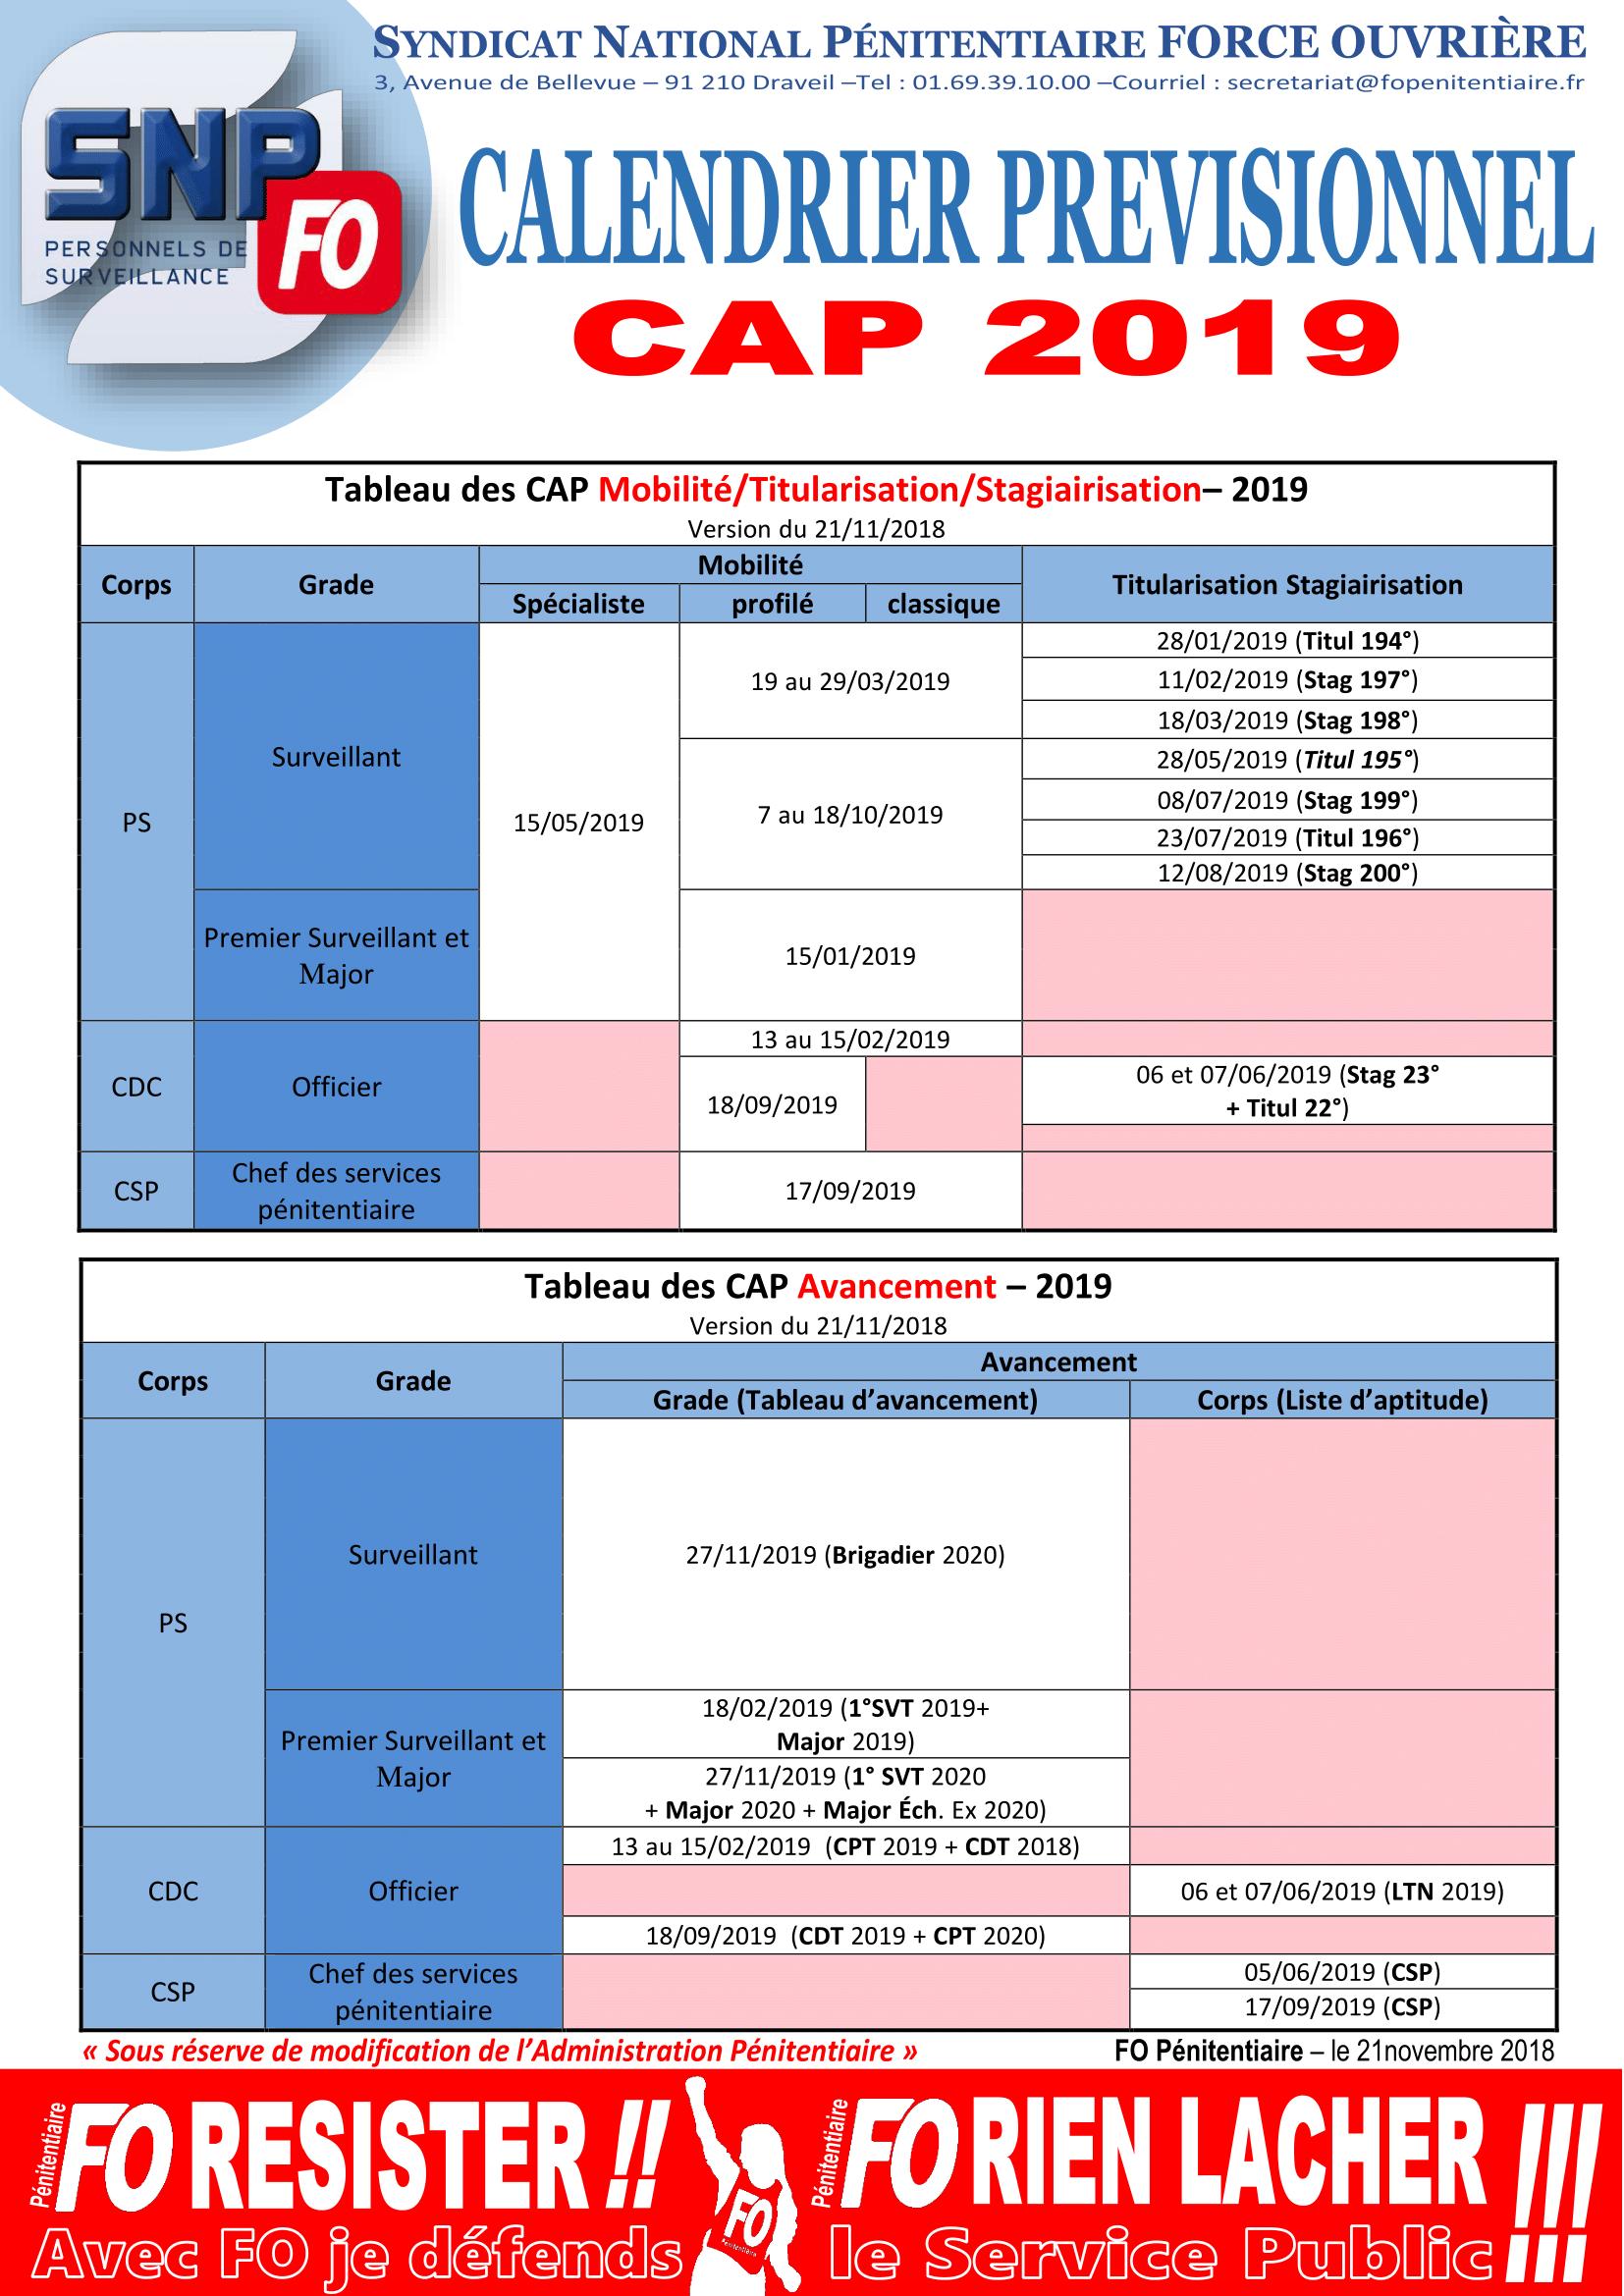 Calendrier CAP – FO Pénitentiaire – UISP Rhône Alpes Auvergne